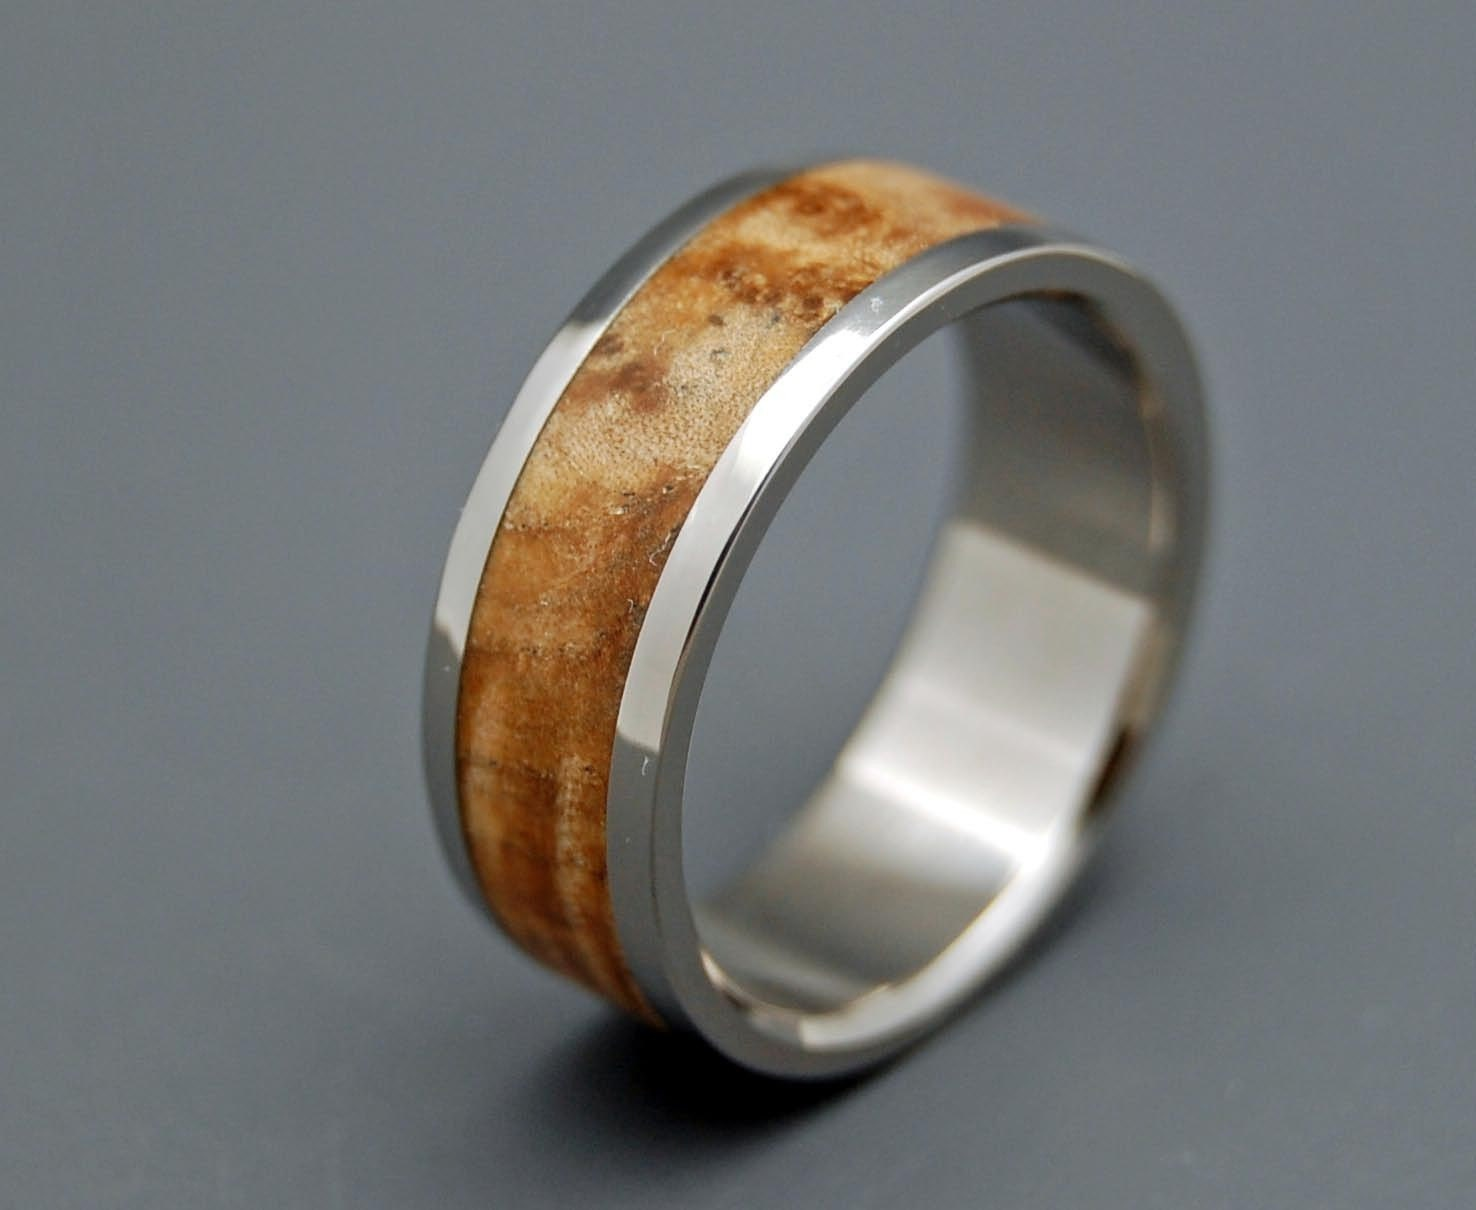 woodstock wooden wedding rings by minterandrichterdes on etsy With wood wedding rings etsy